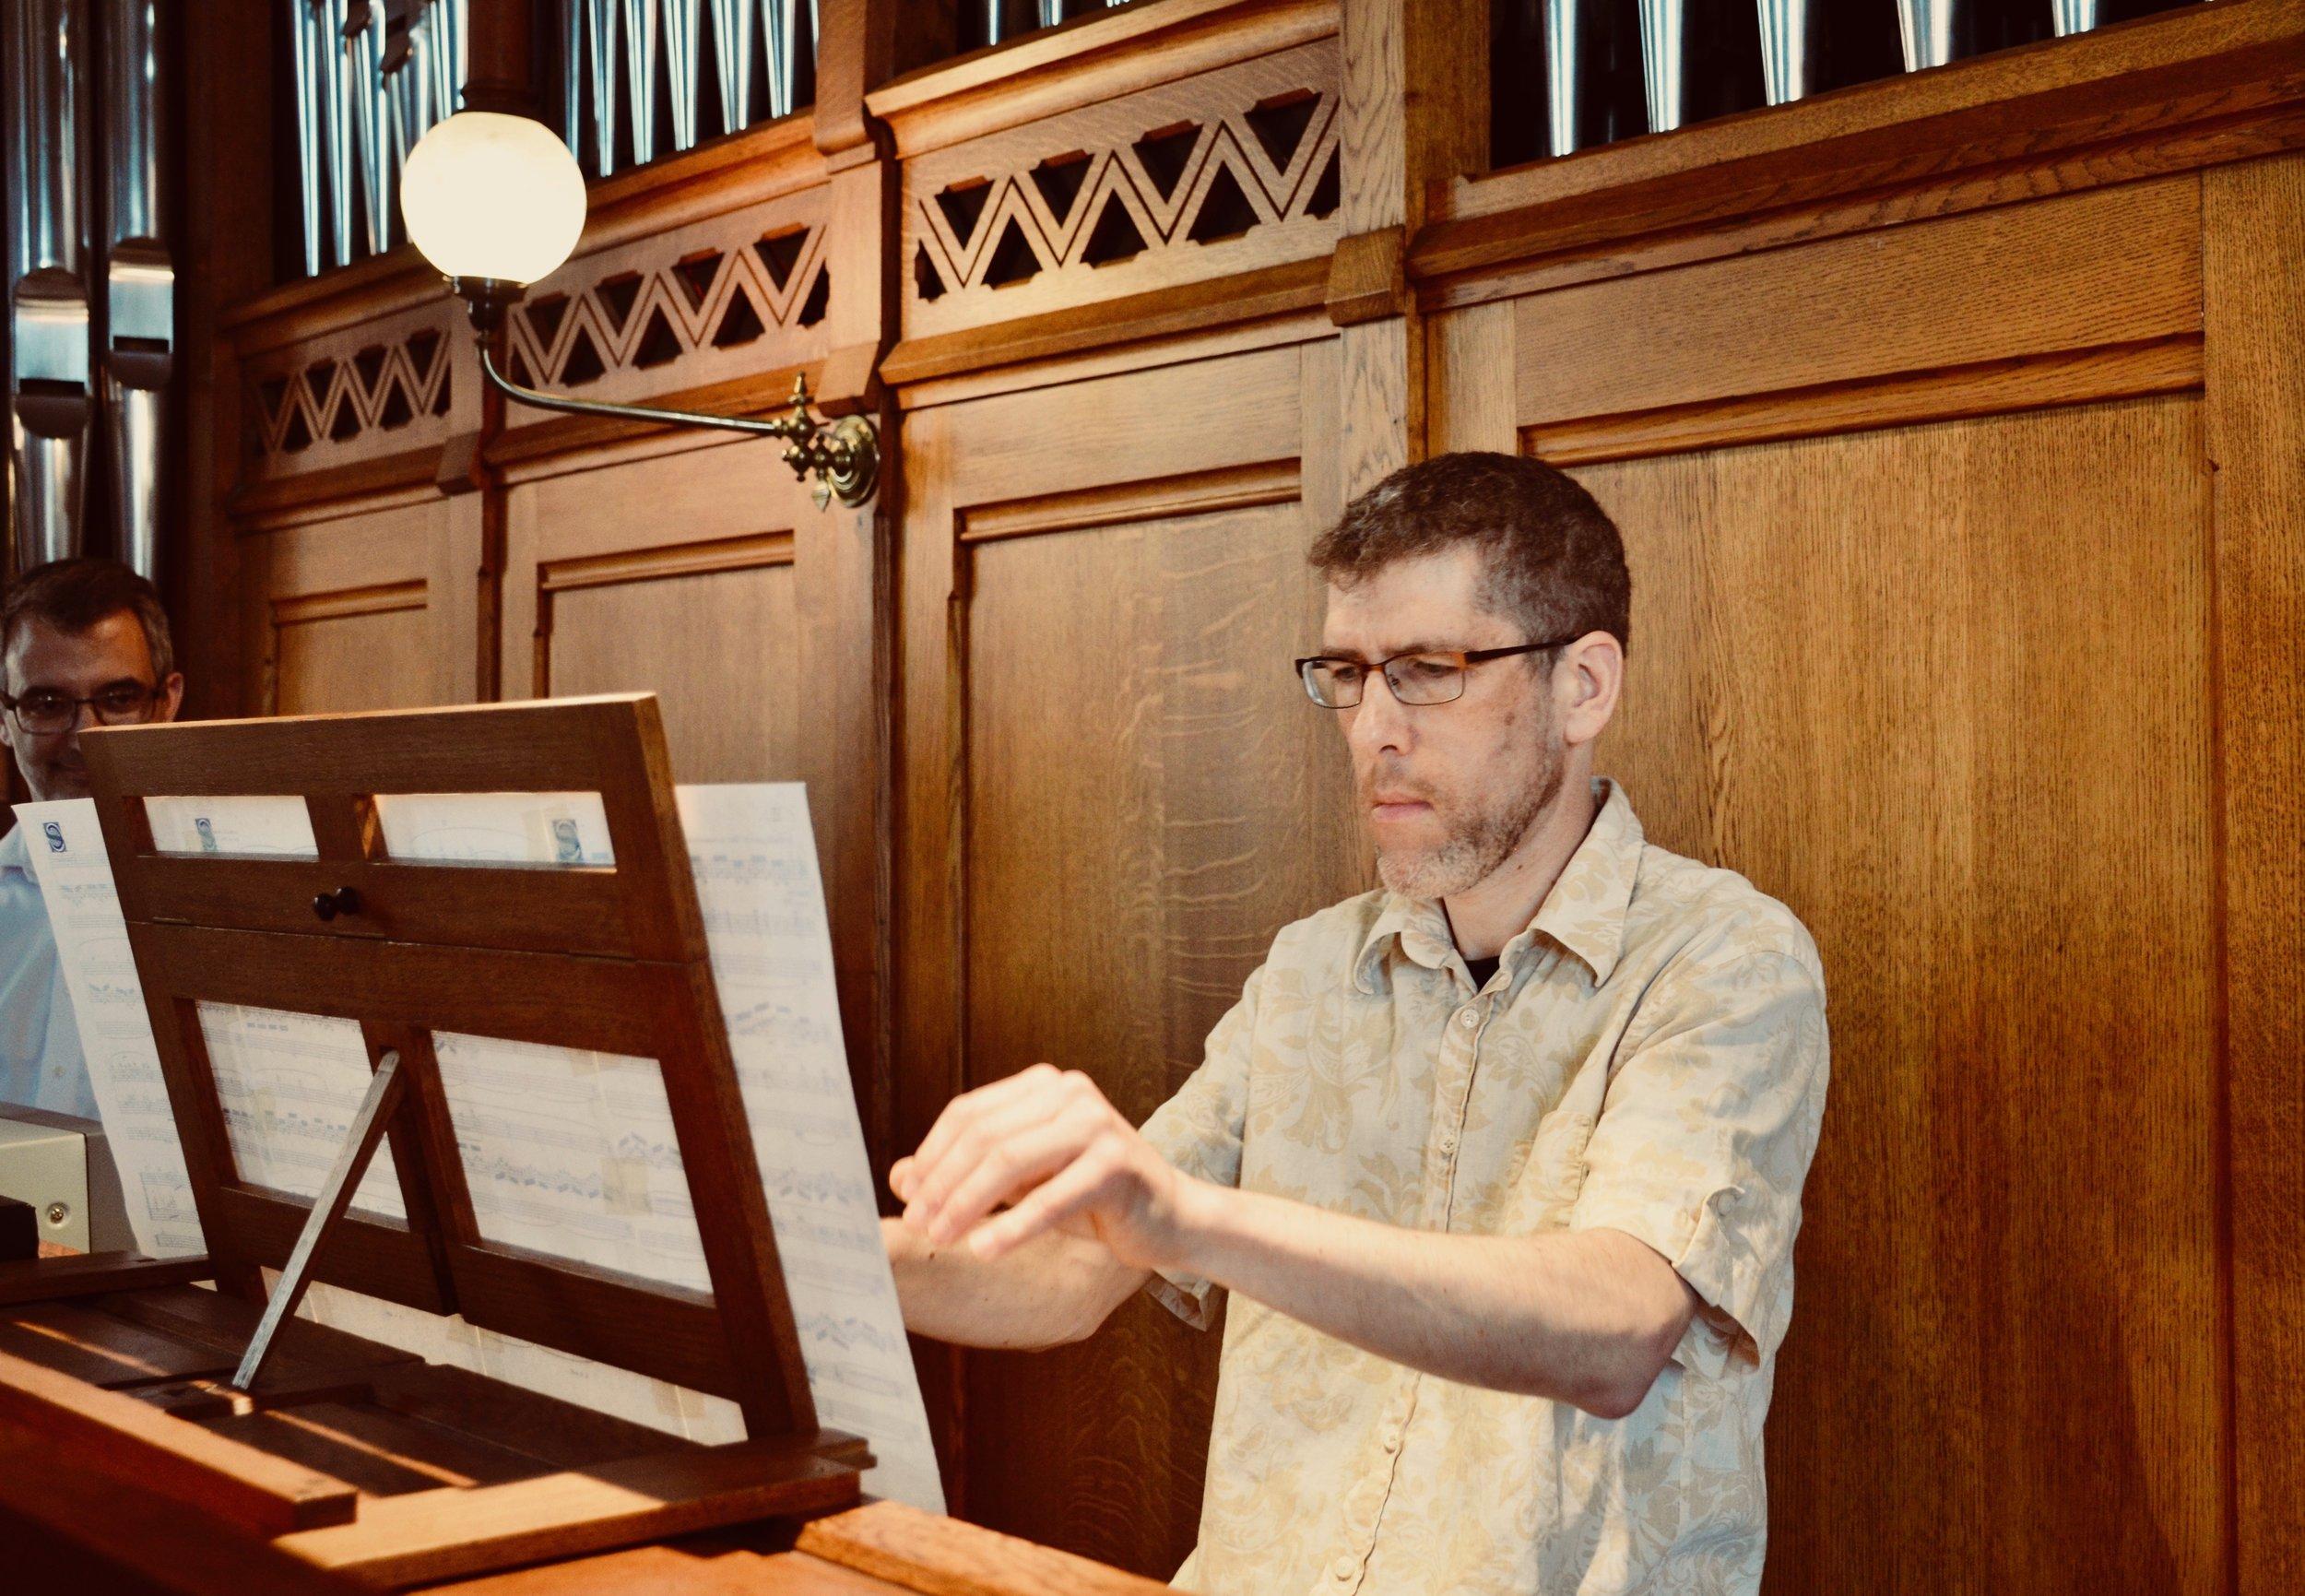 Chris Porter plays the 1890 Cavaillé-Coll organ, Jesuskirke, Copenhagen.